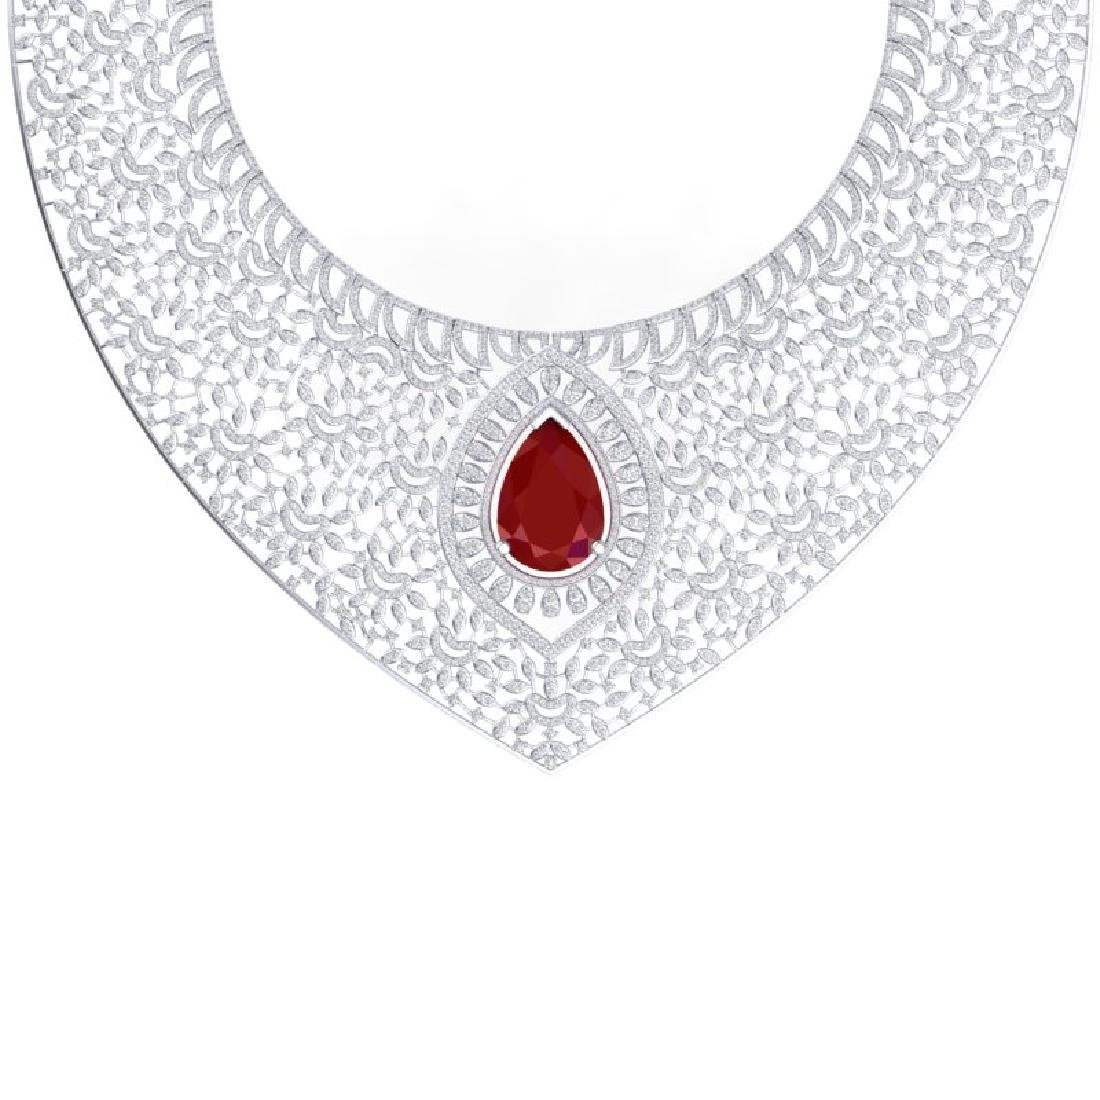 63.93 CTW Royalty Ruby & VS Diamond Necklace 18K White - 2